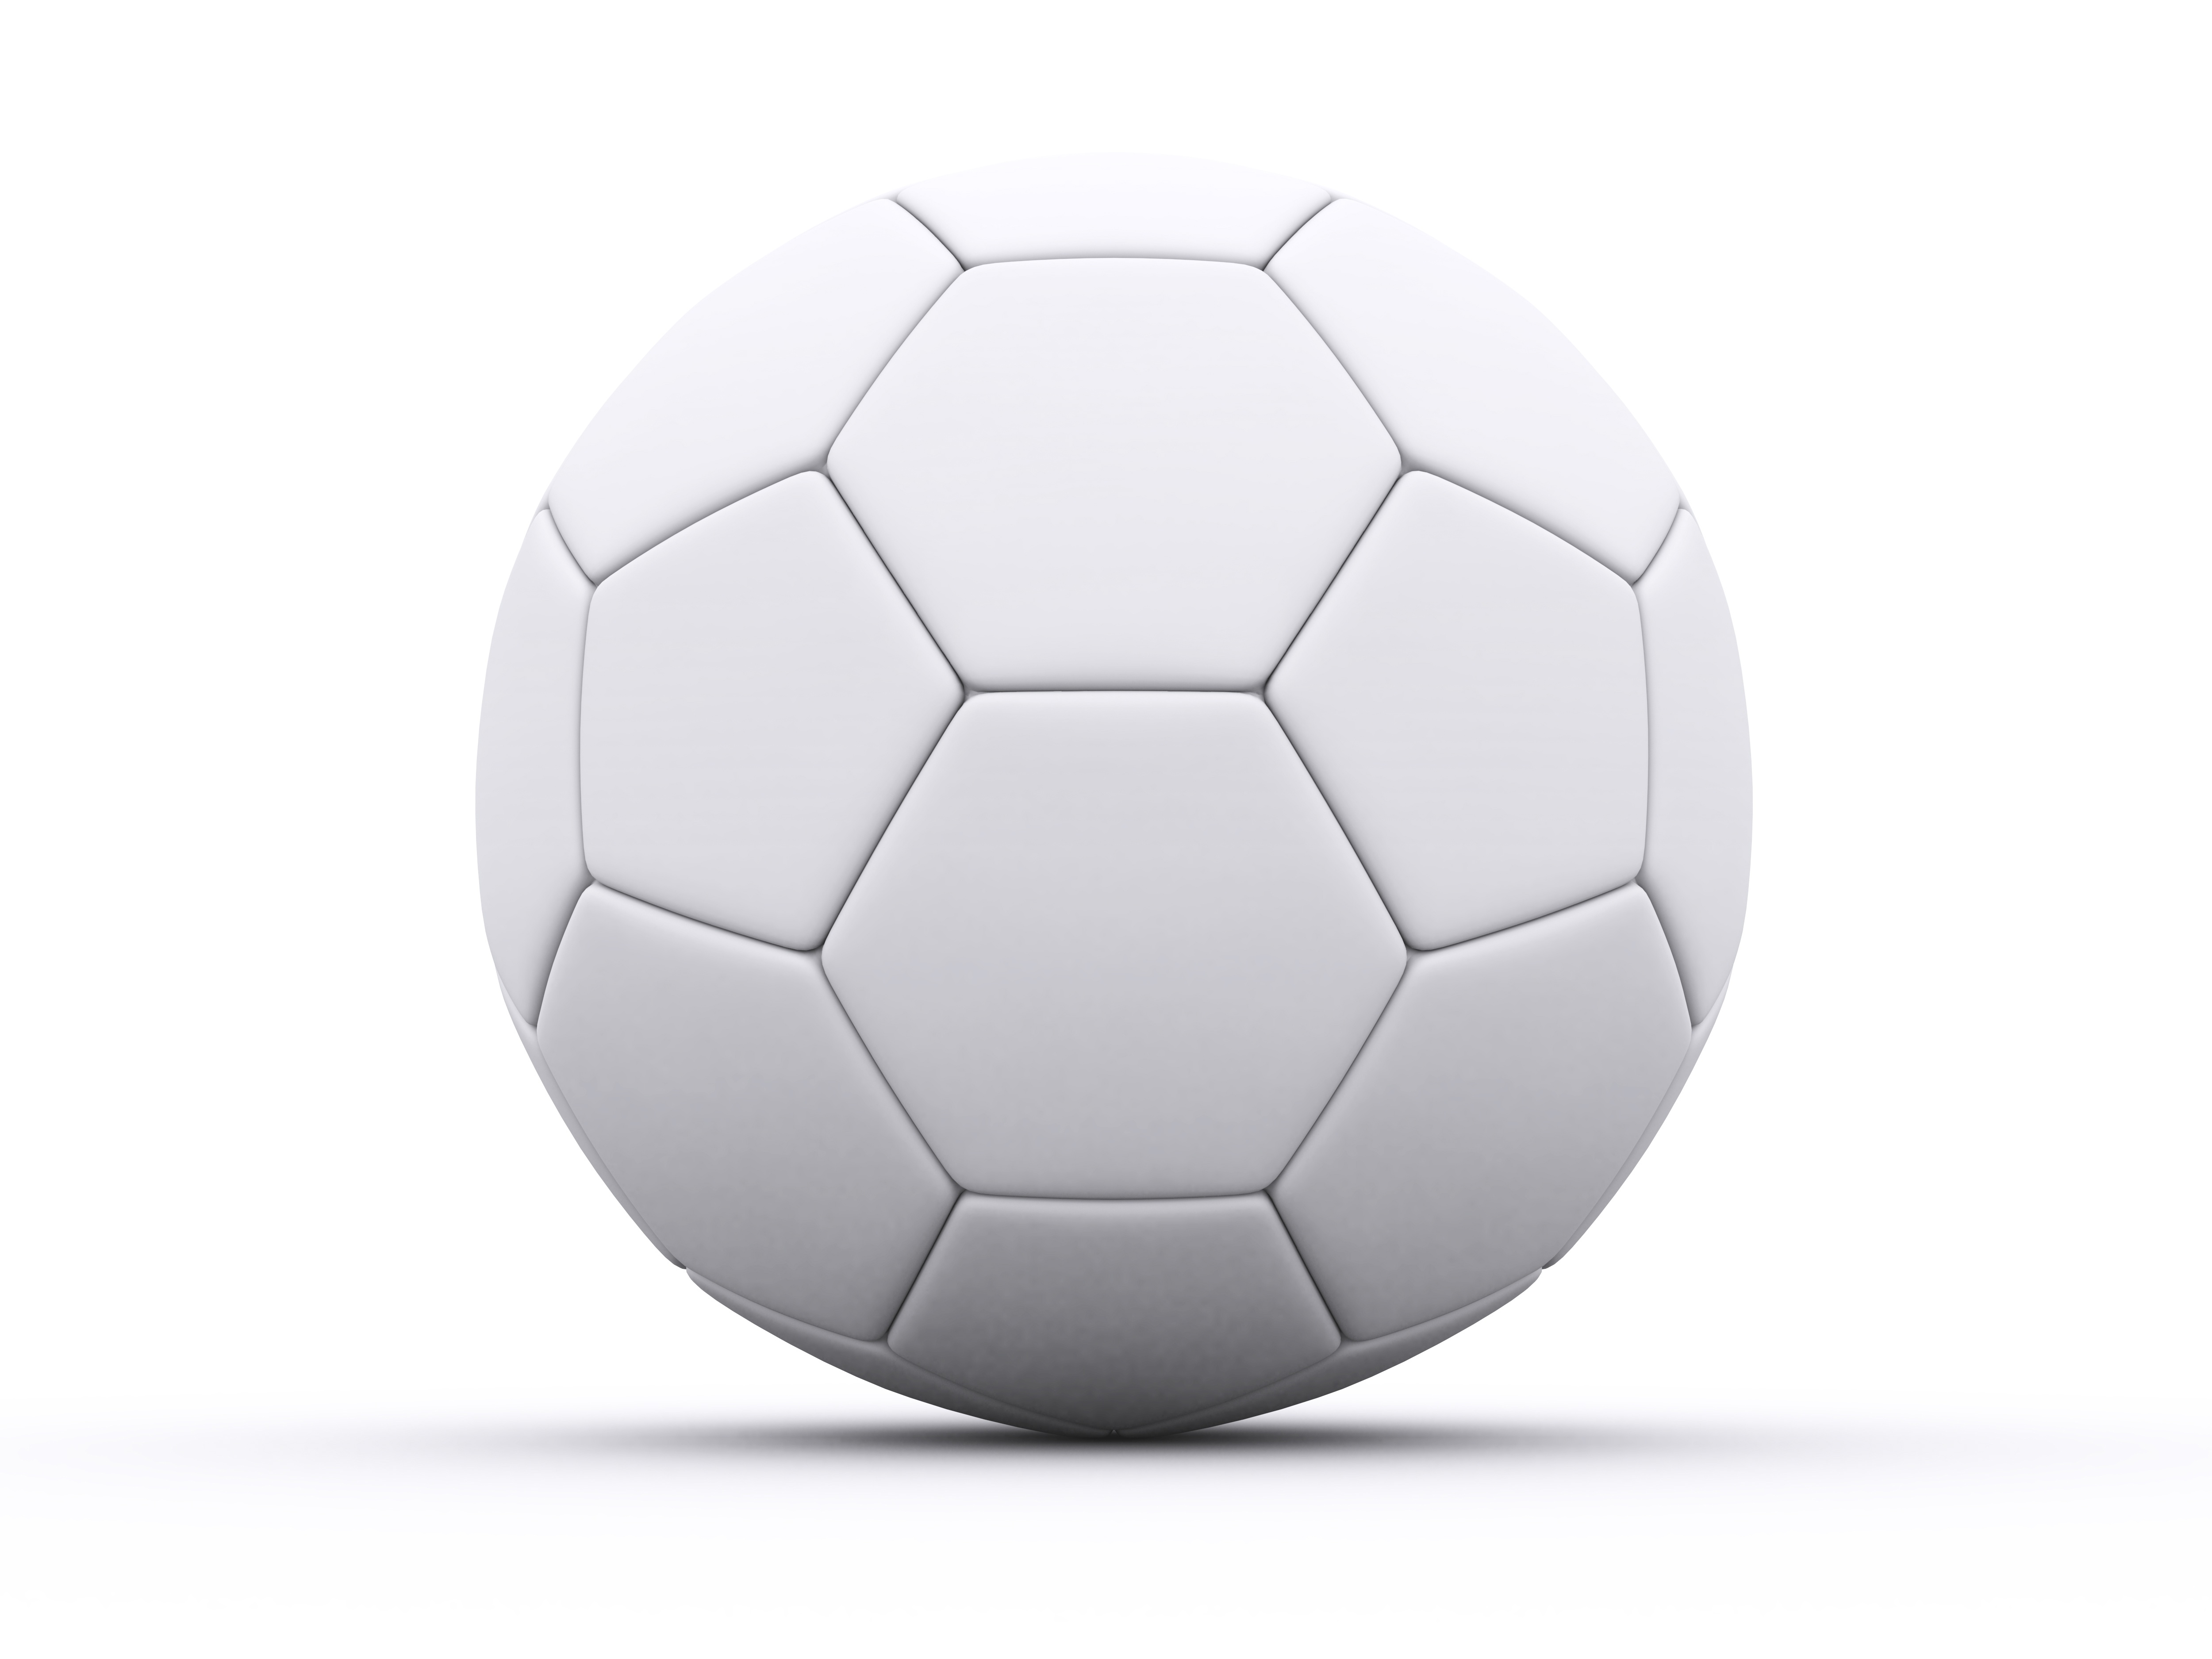 a-3d-white-soccer-ball_GyLUo5ru